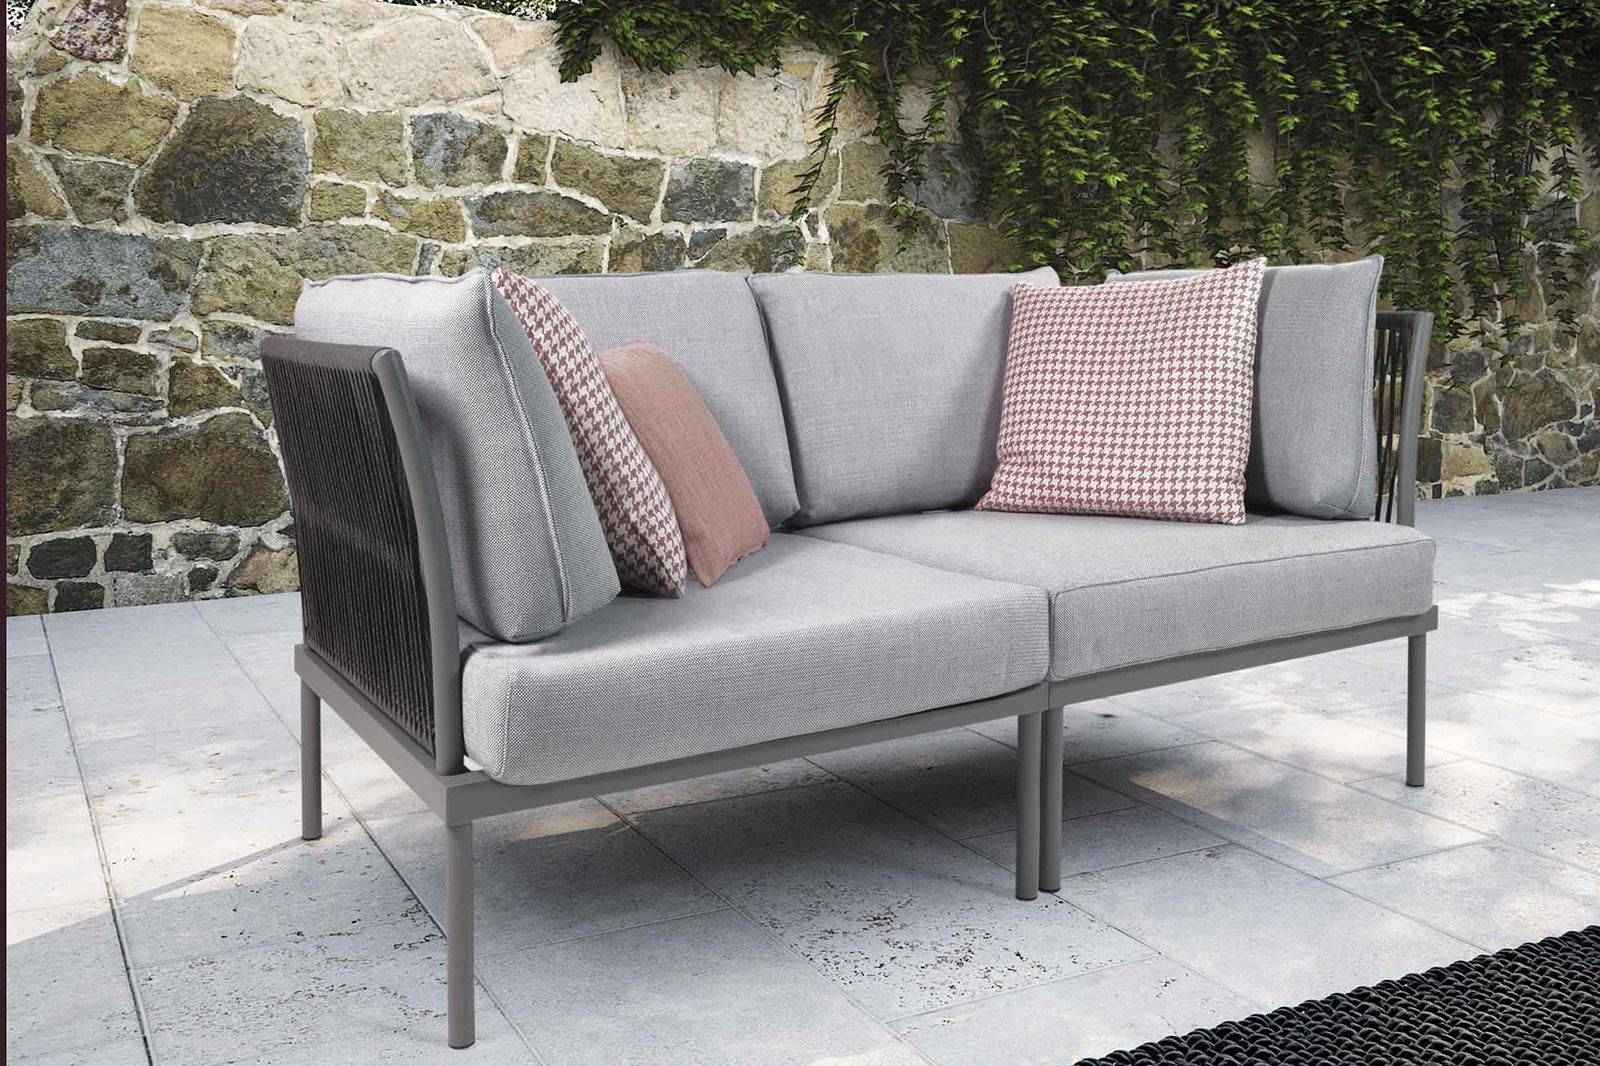 Flare divano 2 posti da esterno vendita online italy for Svendita mobili da giardino